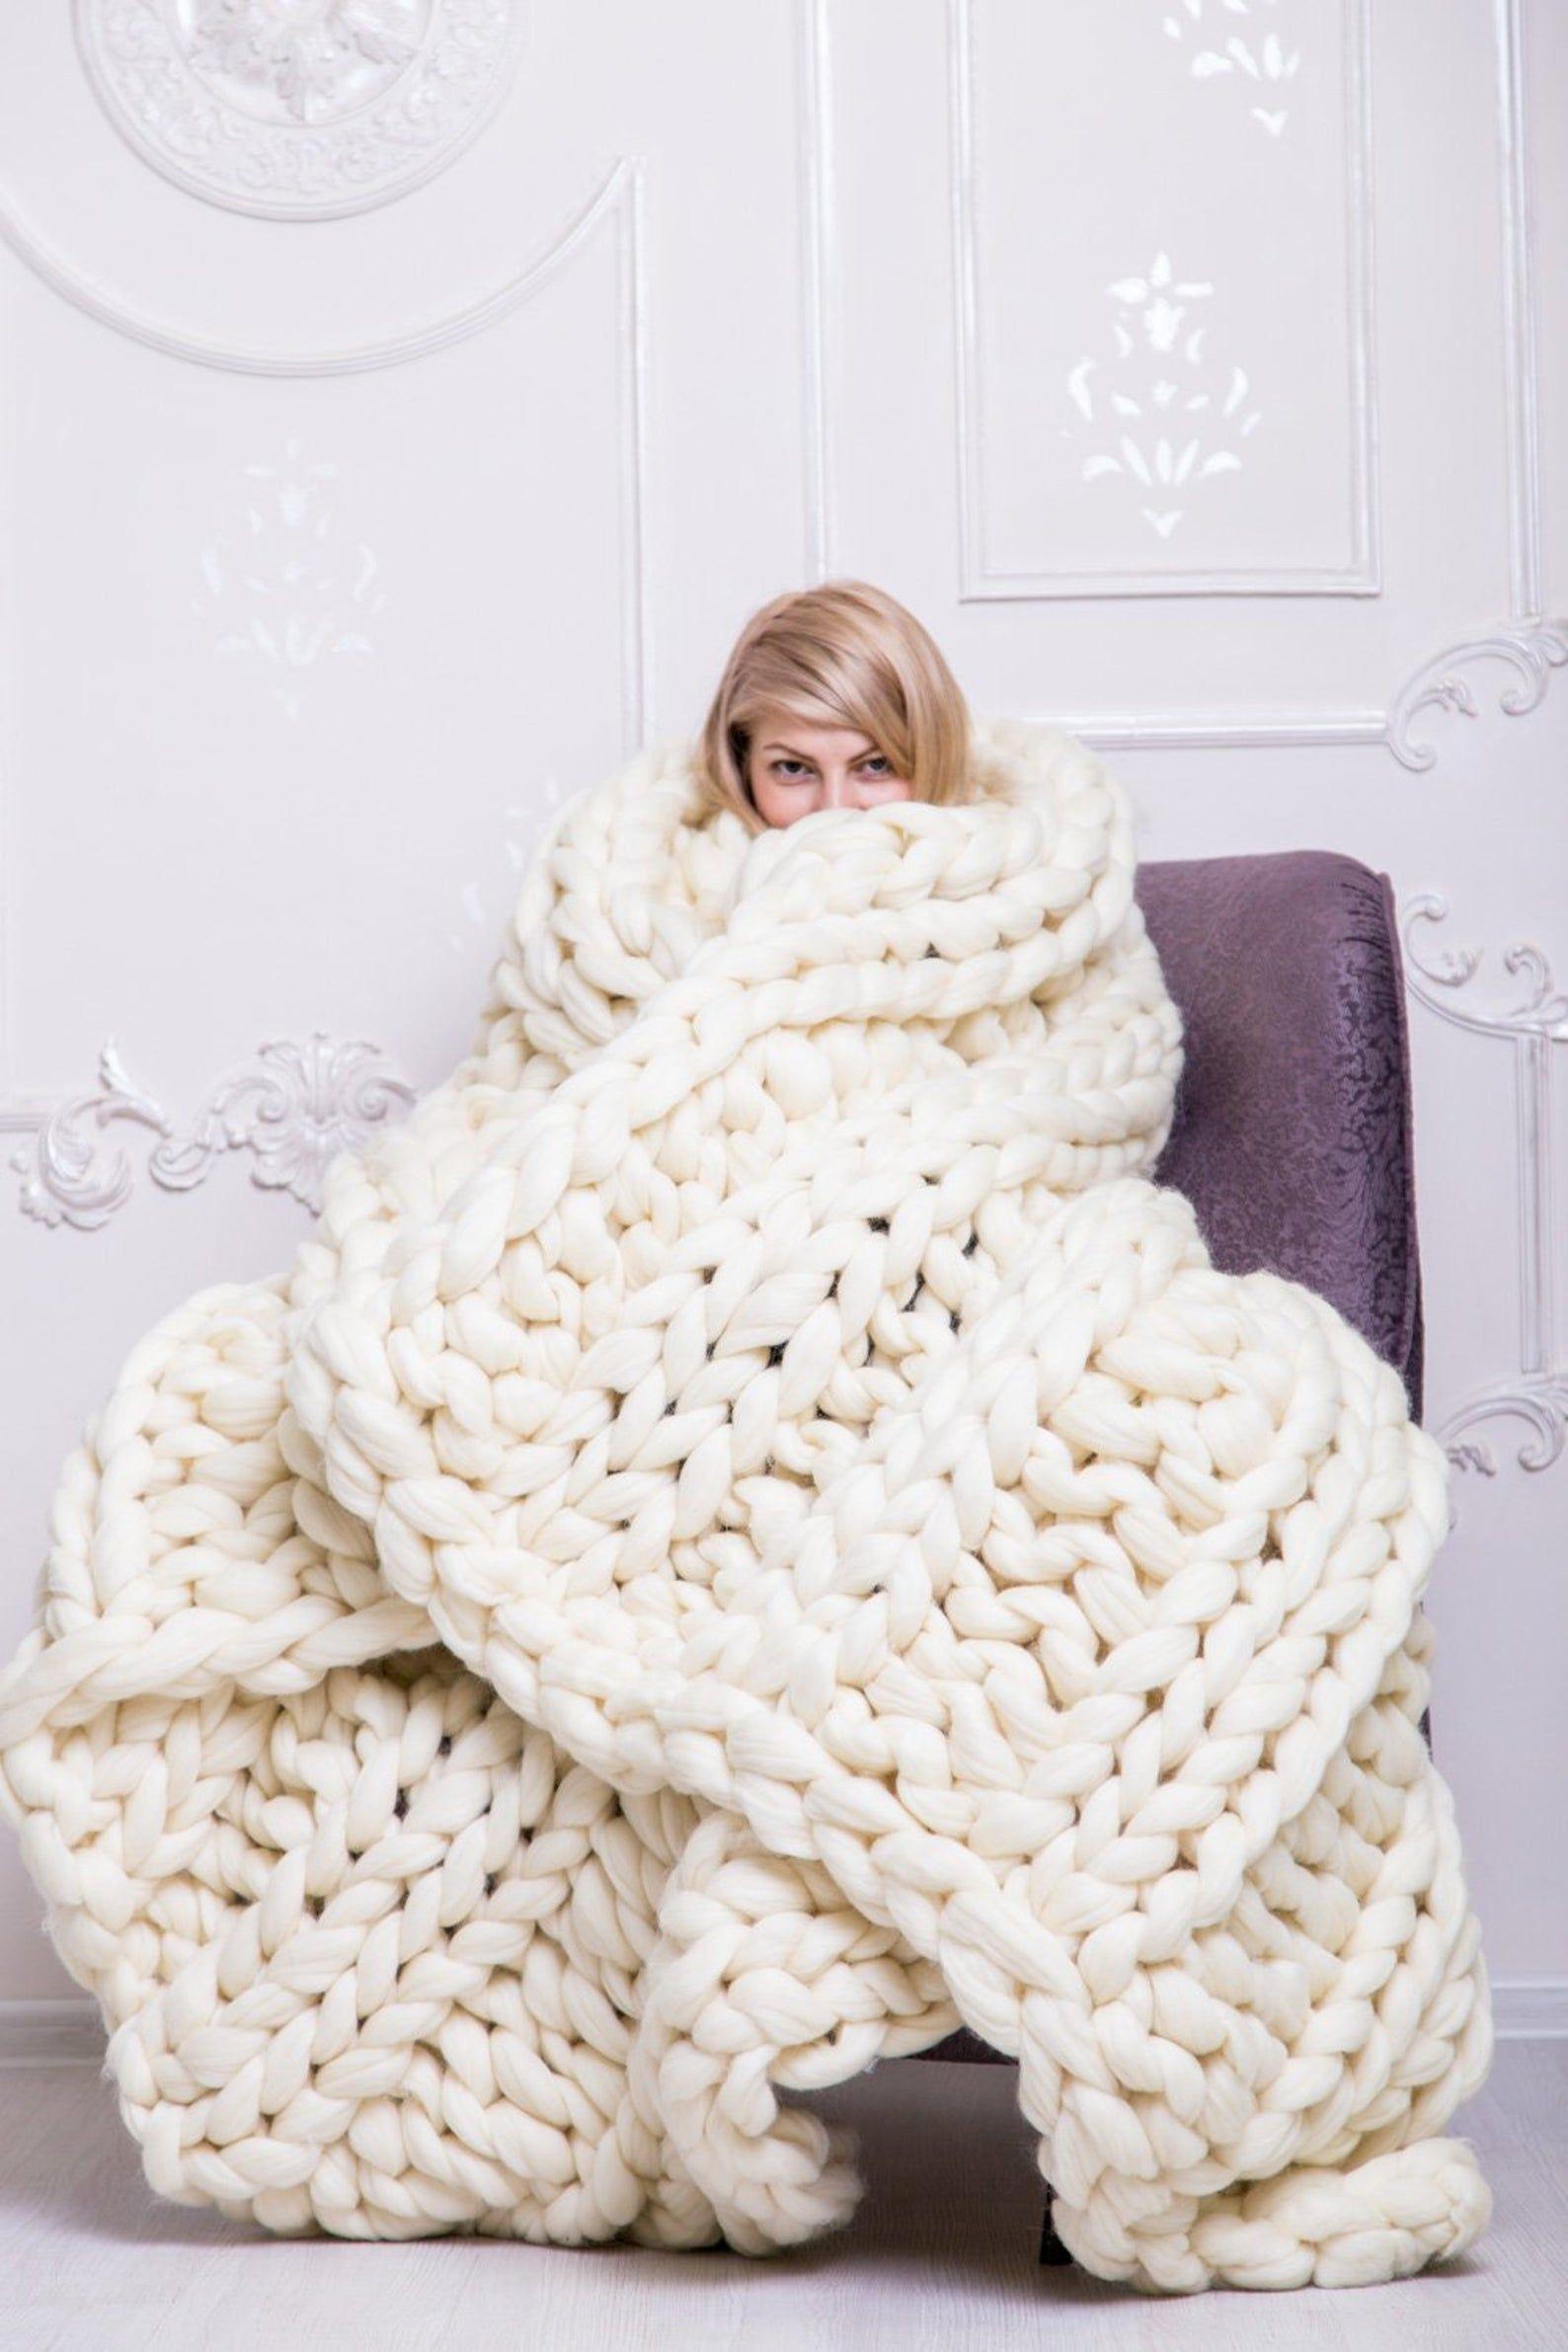 Chunky Knit Blanket Chunky Blanket Knitted Blanket Wool Blanket